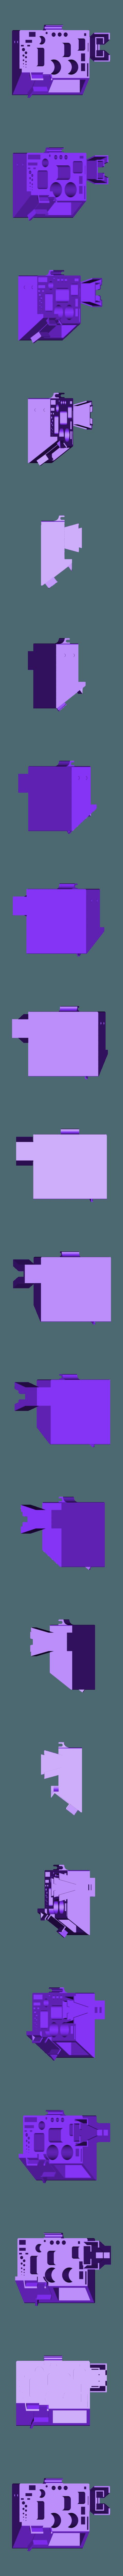 range outil.stl Download free STL file tool range • 3D printable model, CedricWeier